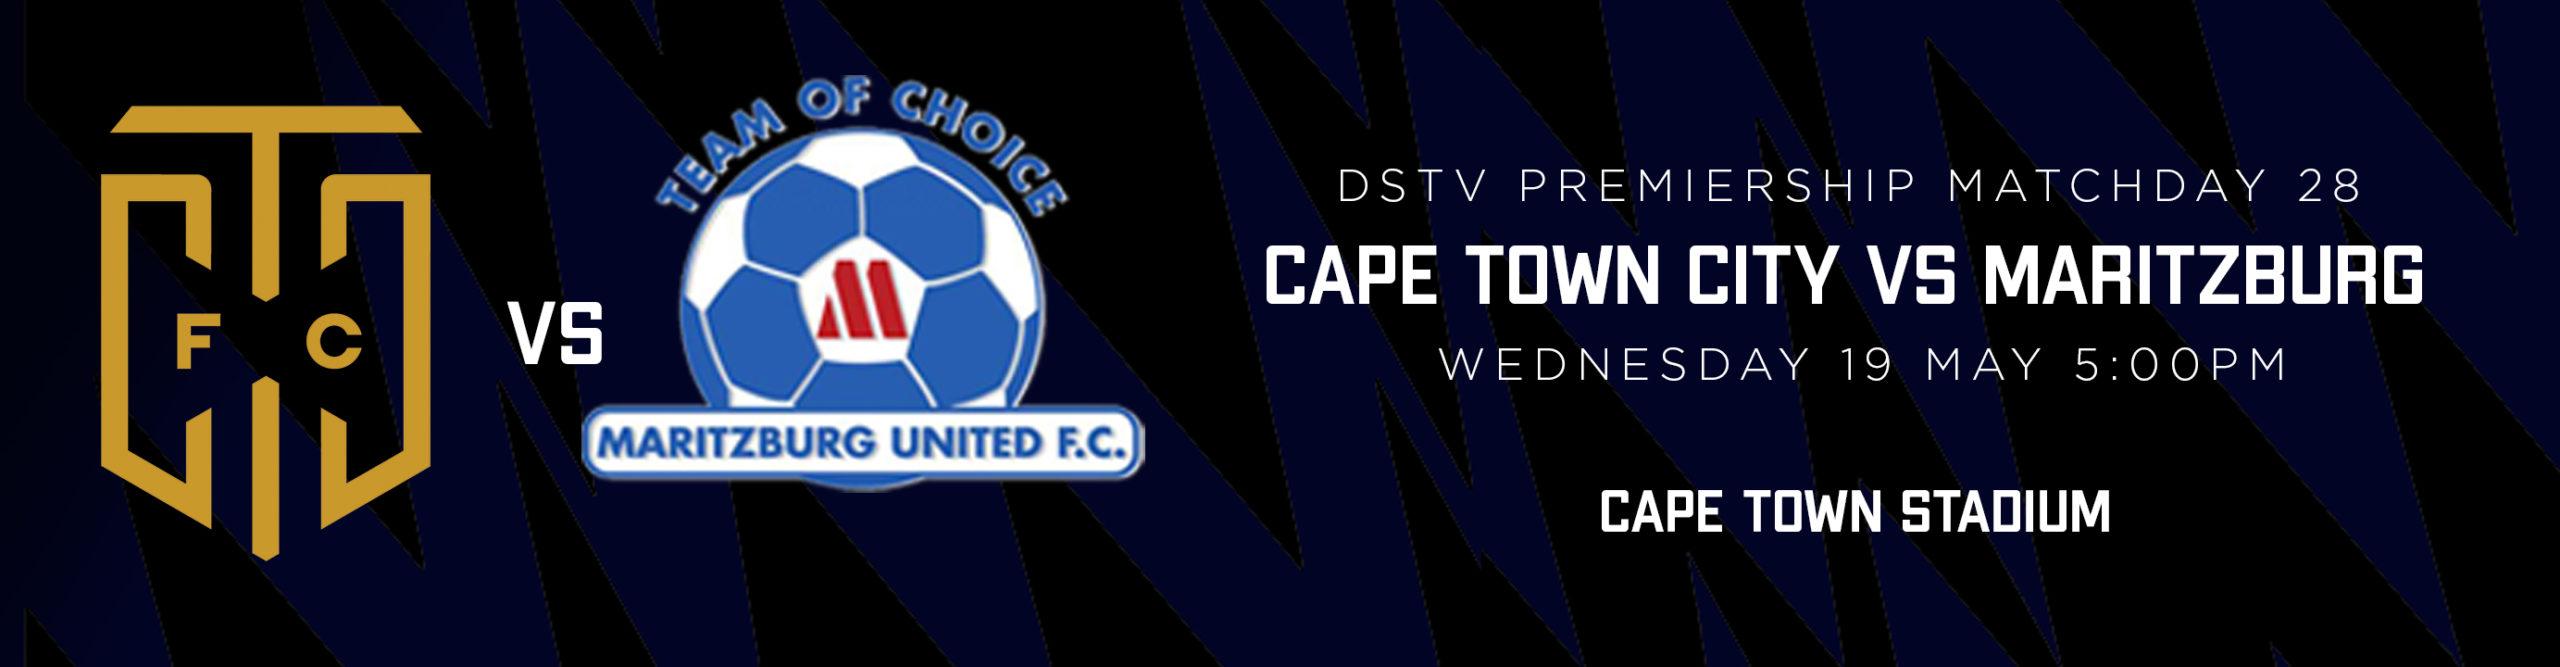 Cape Town City FC vs Maritzburg United FC